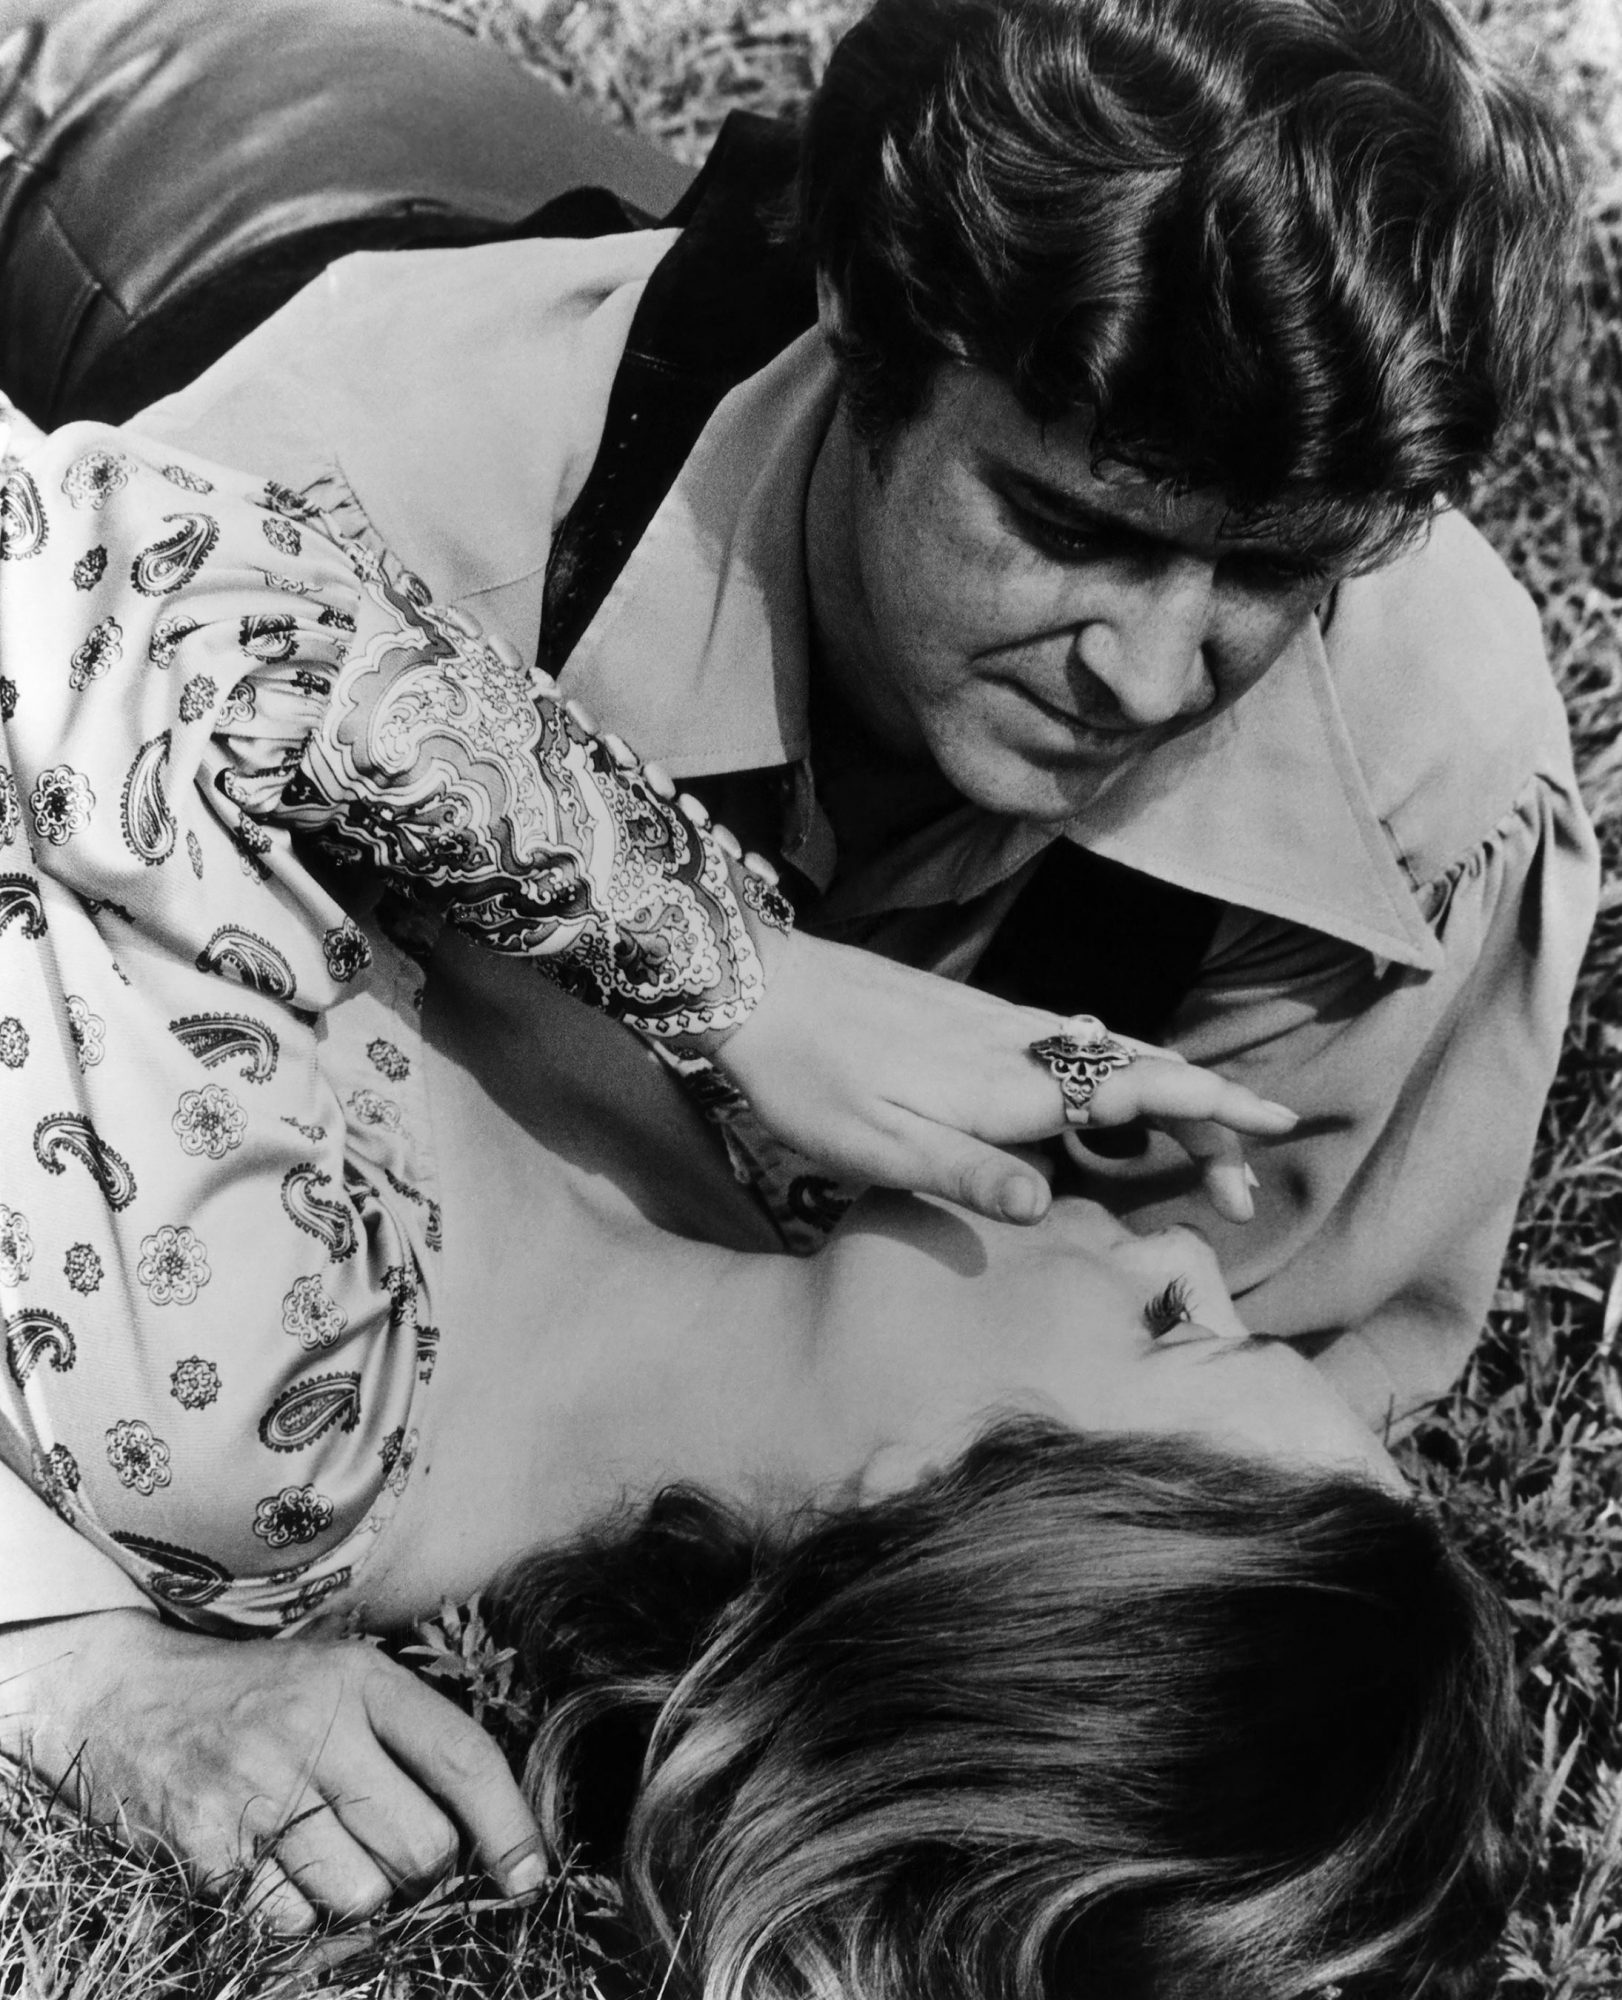 THERE'S ALWAYS VANILLA, (aka THE AFFAIR), Raymond Laine, Judith Streiner (aka Judith Ridley), 1971